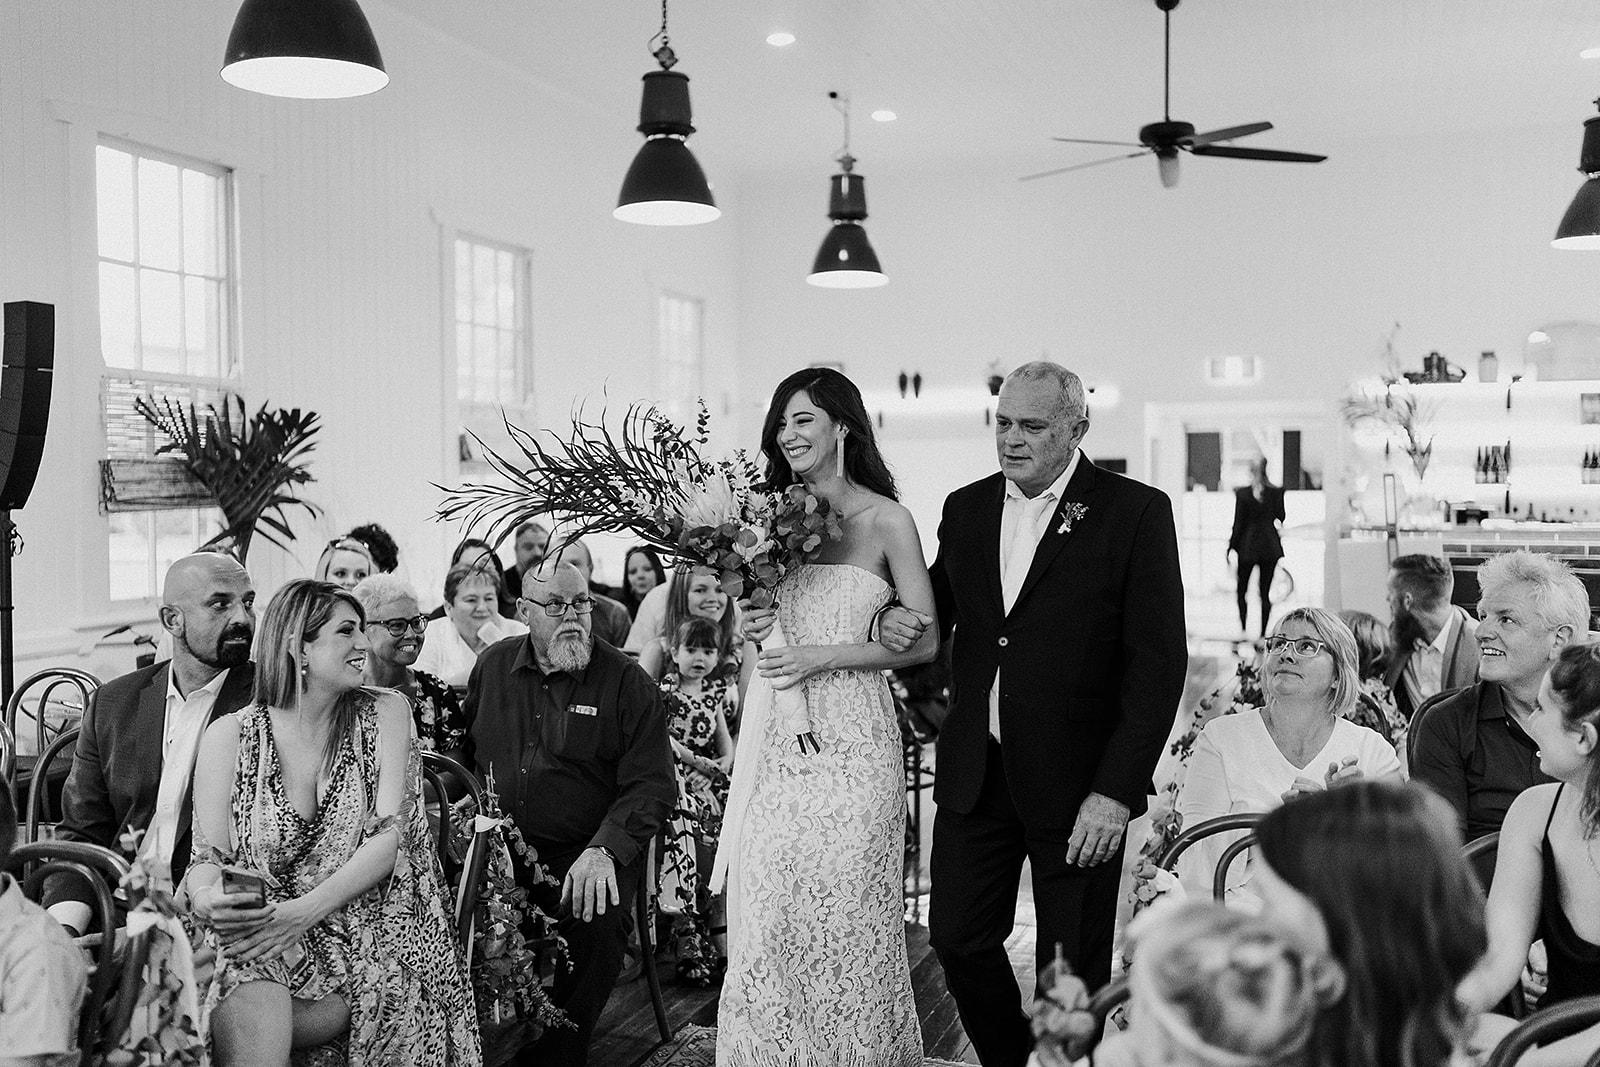 Loyal Hope weddings